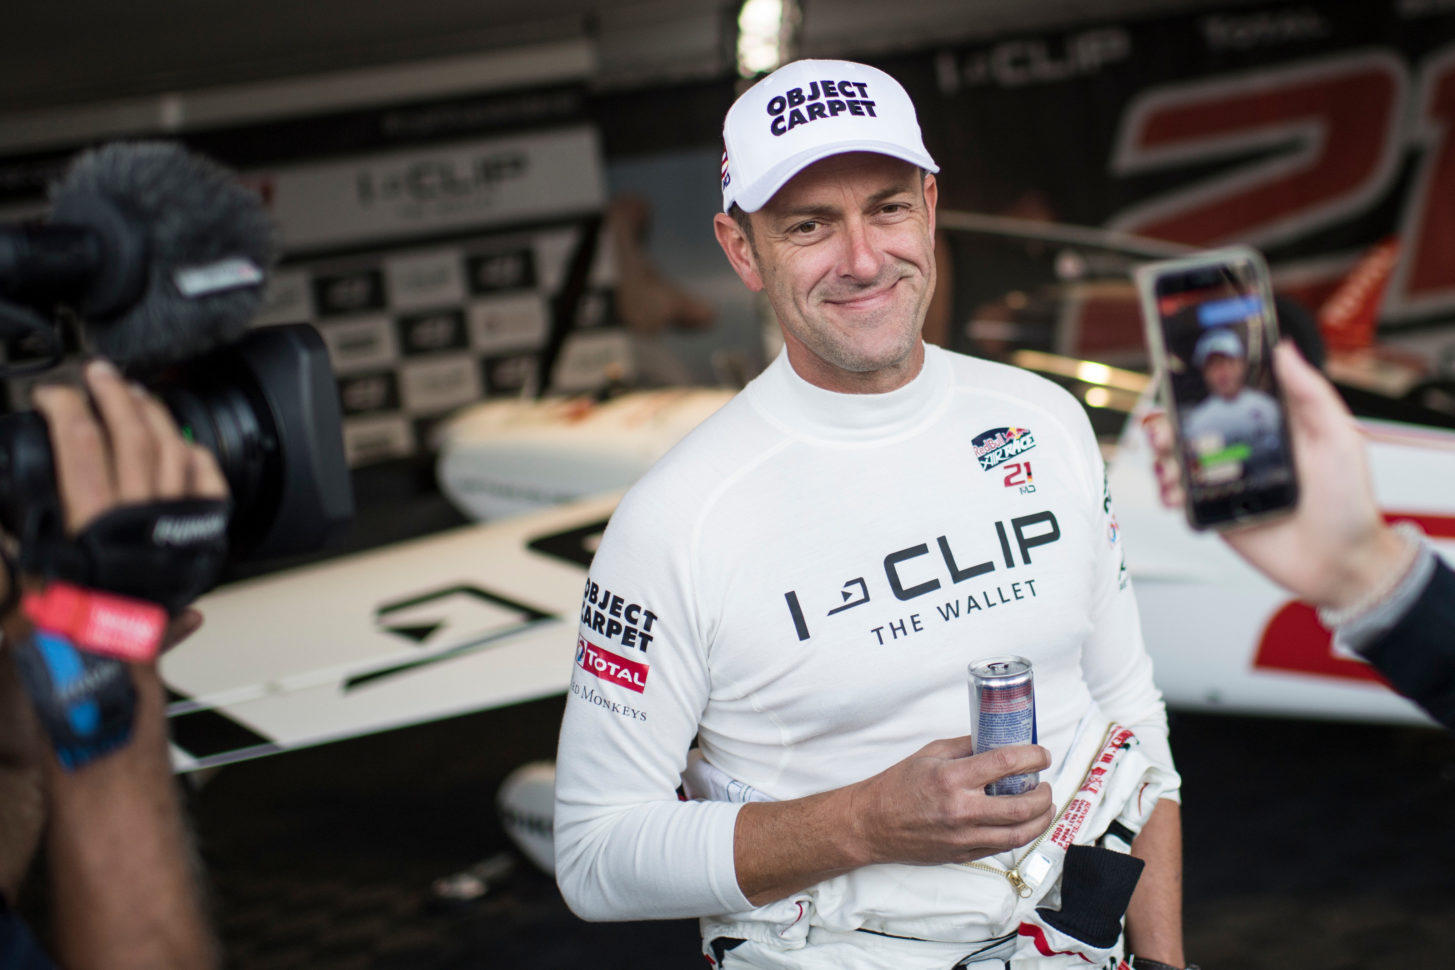 Der deutsche Red Bull Air Race Pilot Matthias Dolderer